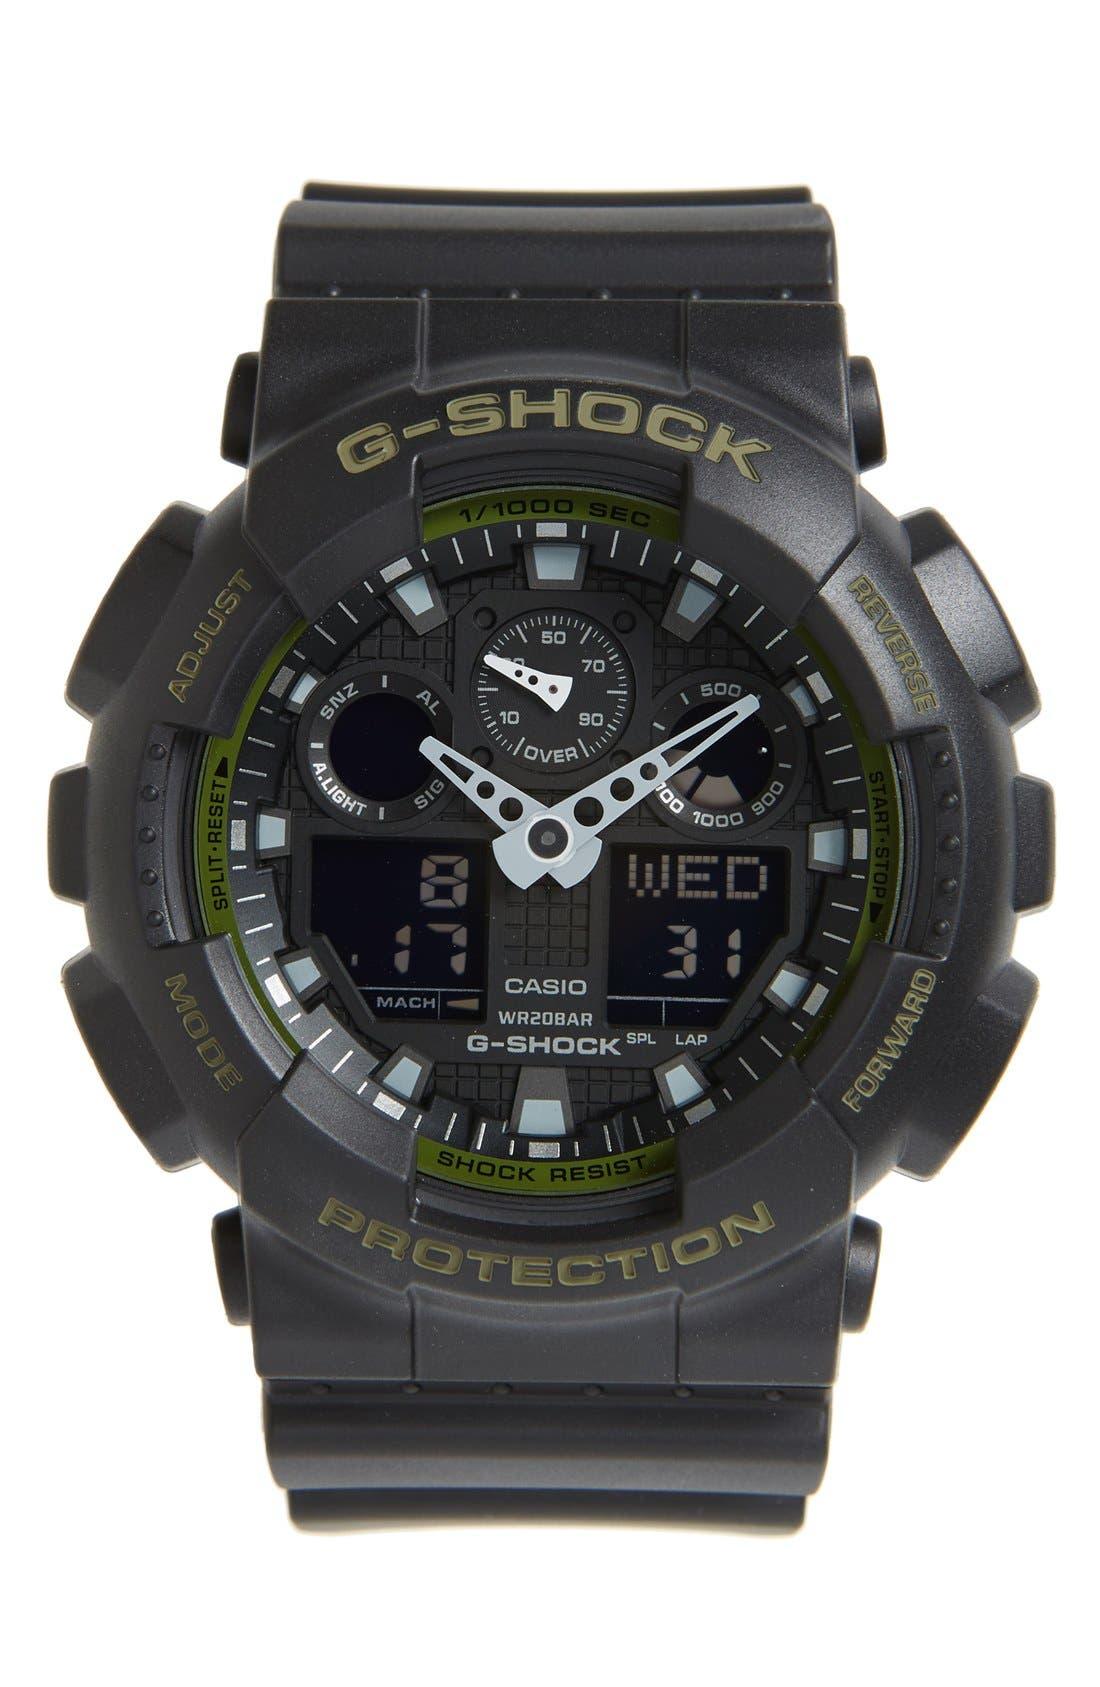 G-SHOCK BABY-G G-Shock Big Combi Watch, 55mm x 51mm